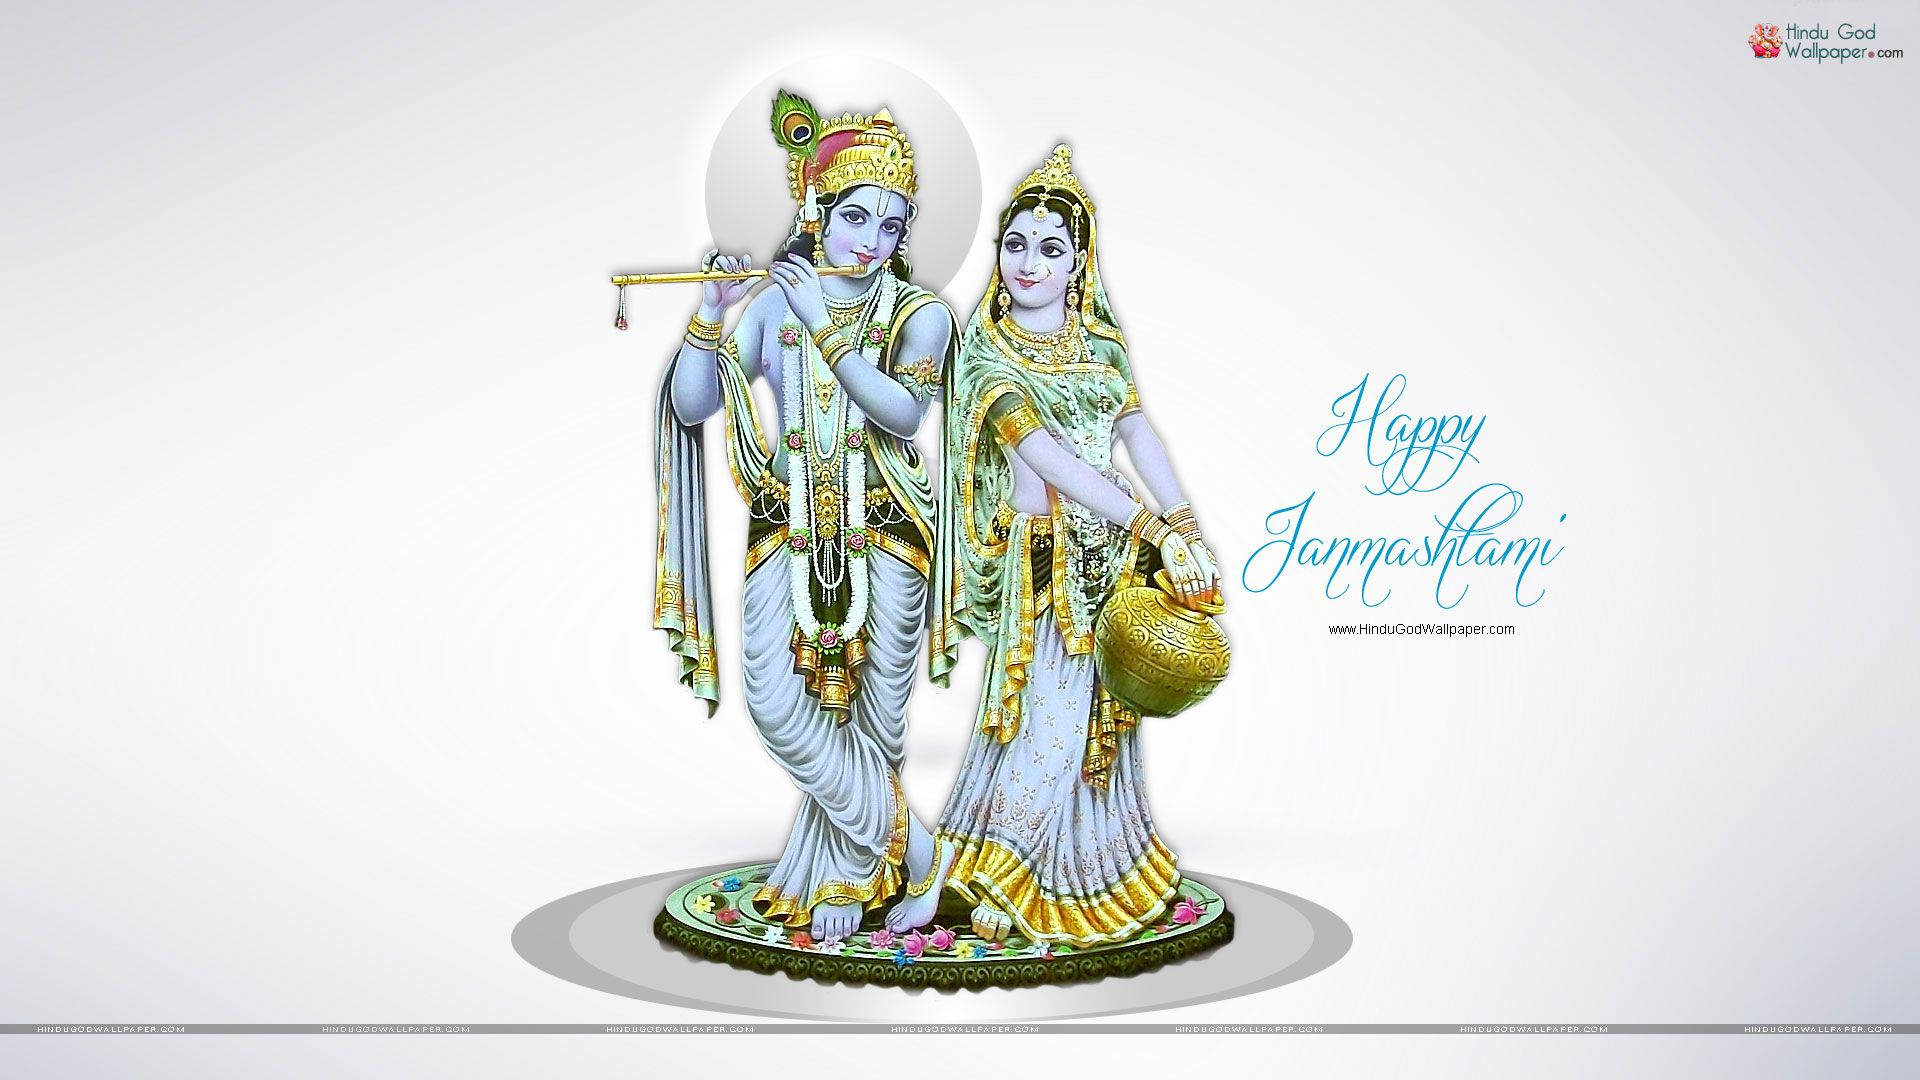 Krishna Janmashtami Wallpapers Full Hd Size Download Janmashtami Wallpapers Krishna Janmashtami Janmashtami Pictures